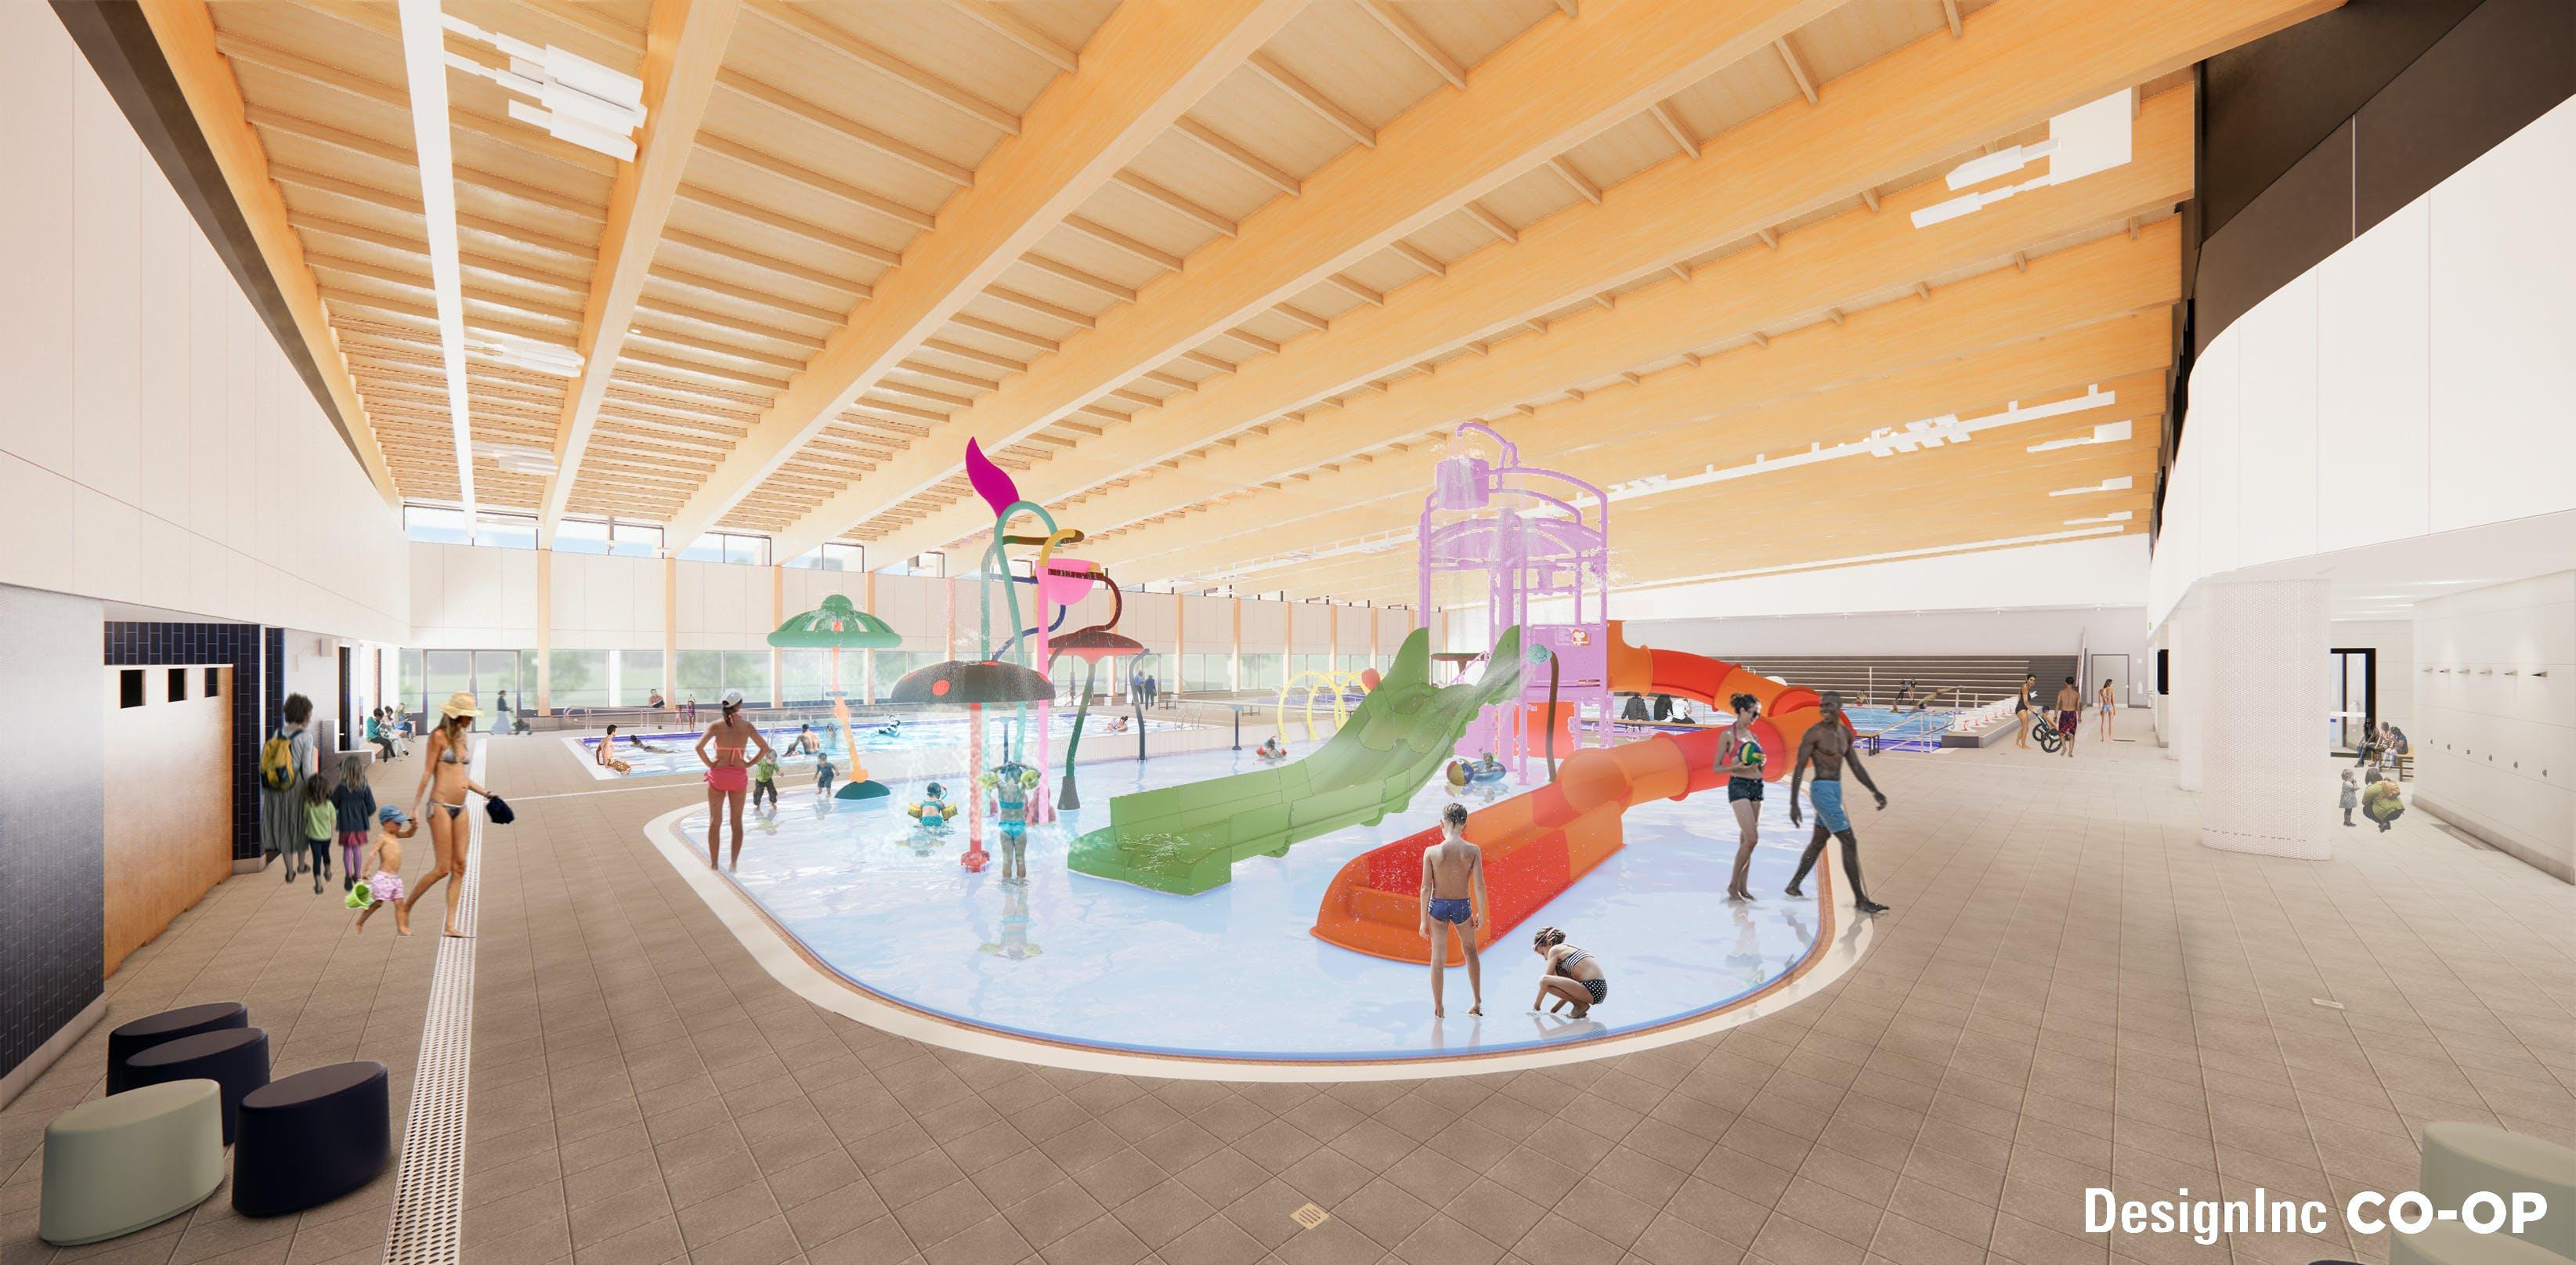 Splash Play Zone - Aquatics Hall